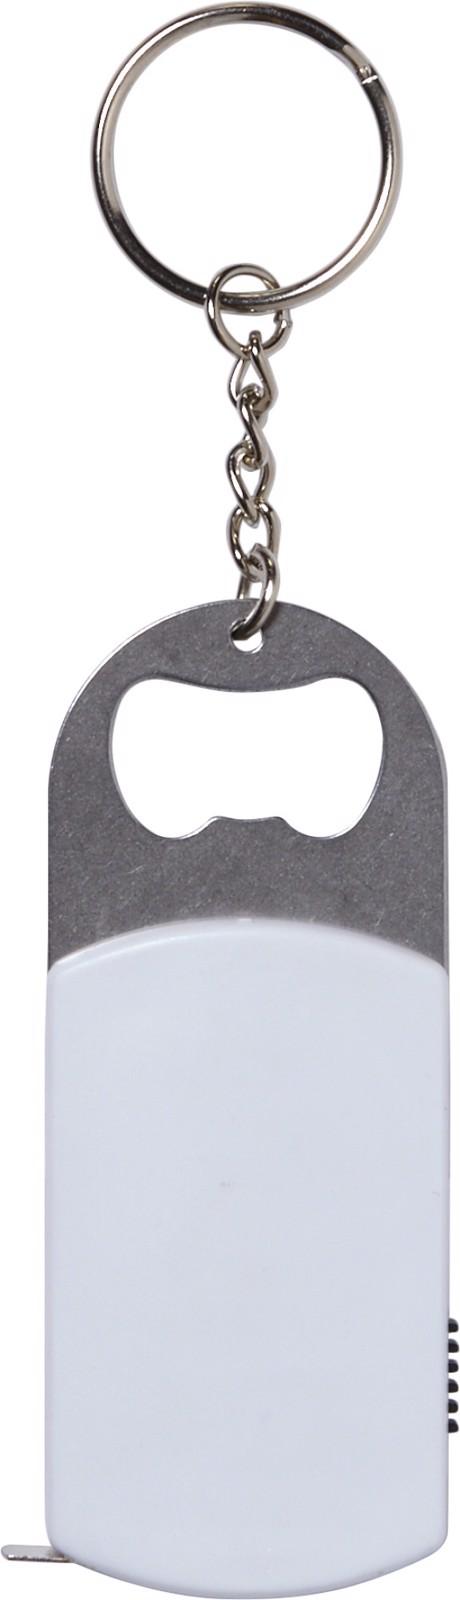 ABS key holder with bottle opener - White